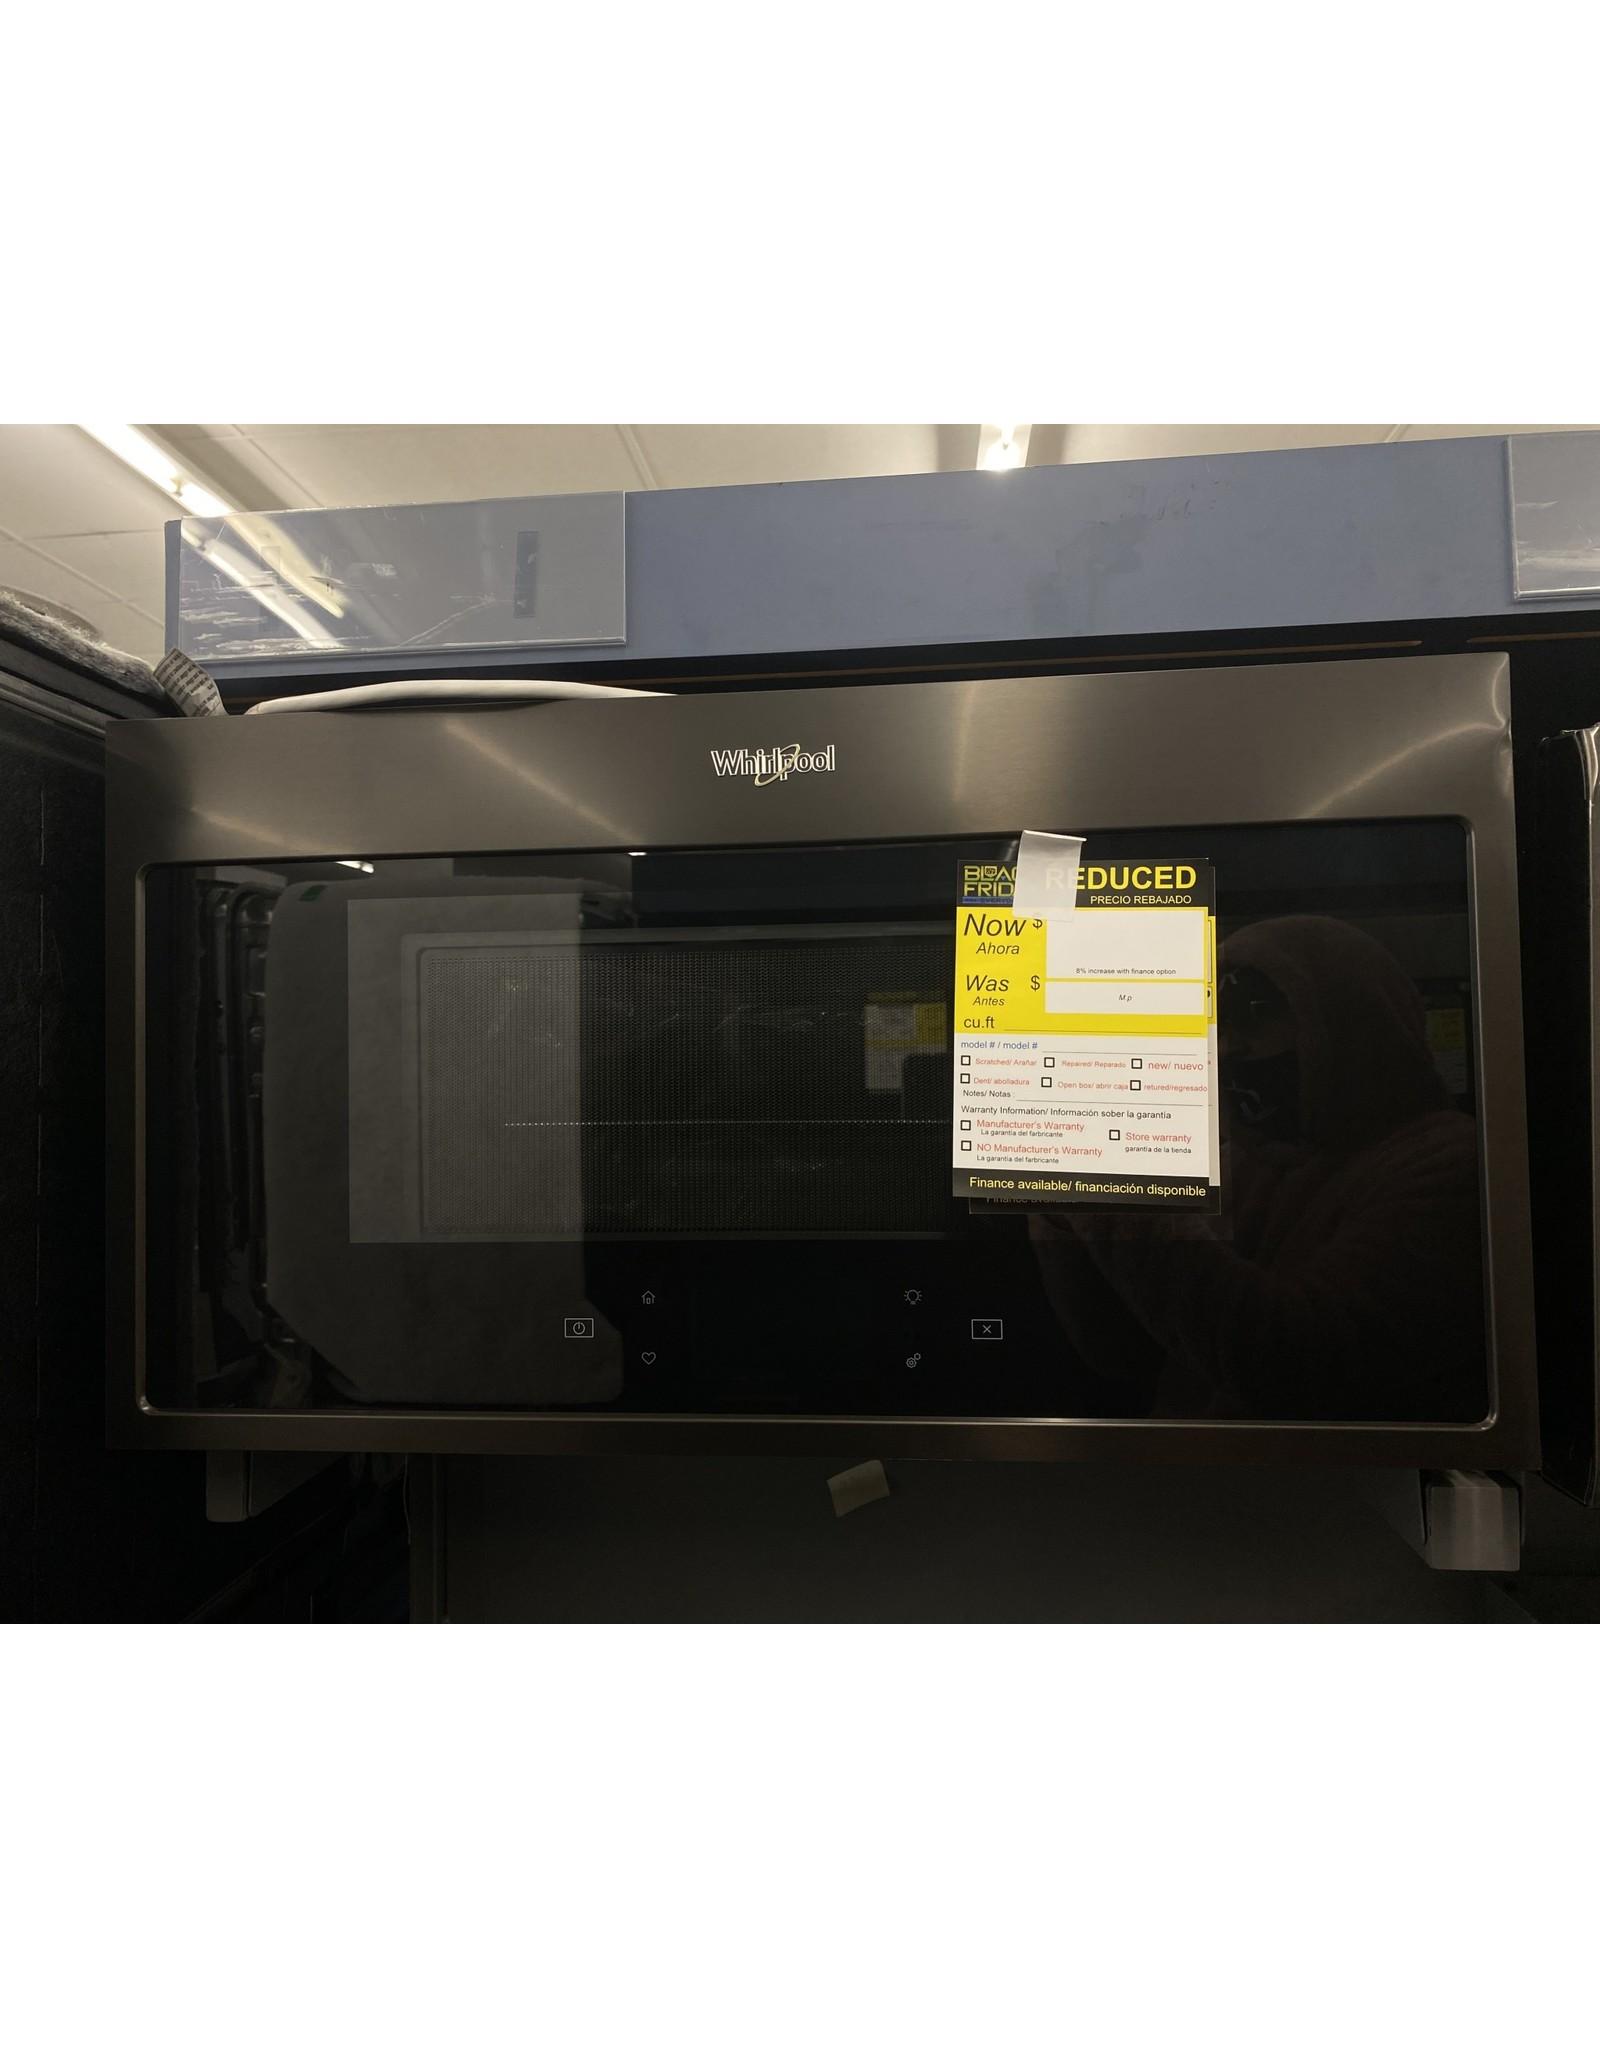 WMHA9019HV WHR Microwave, Hood, Combination - 1.9 CU FT, 1100/1600 WATTS, TRUE CONVECT